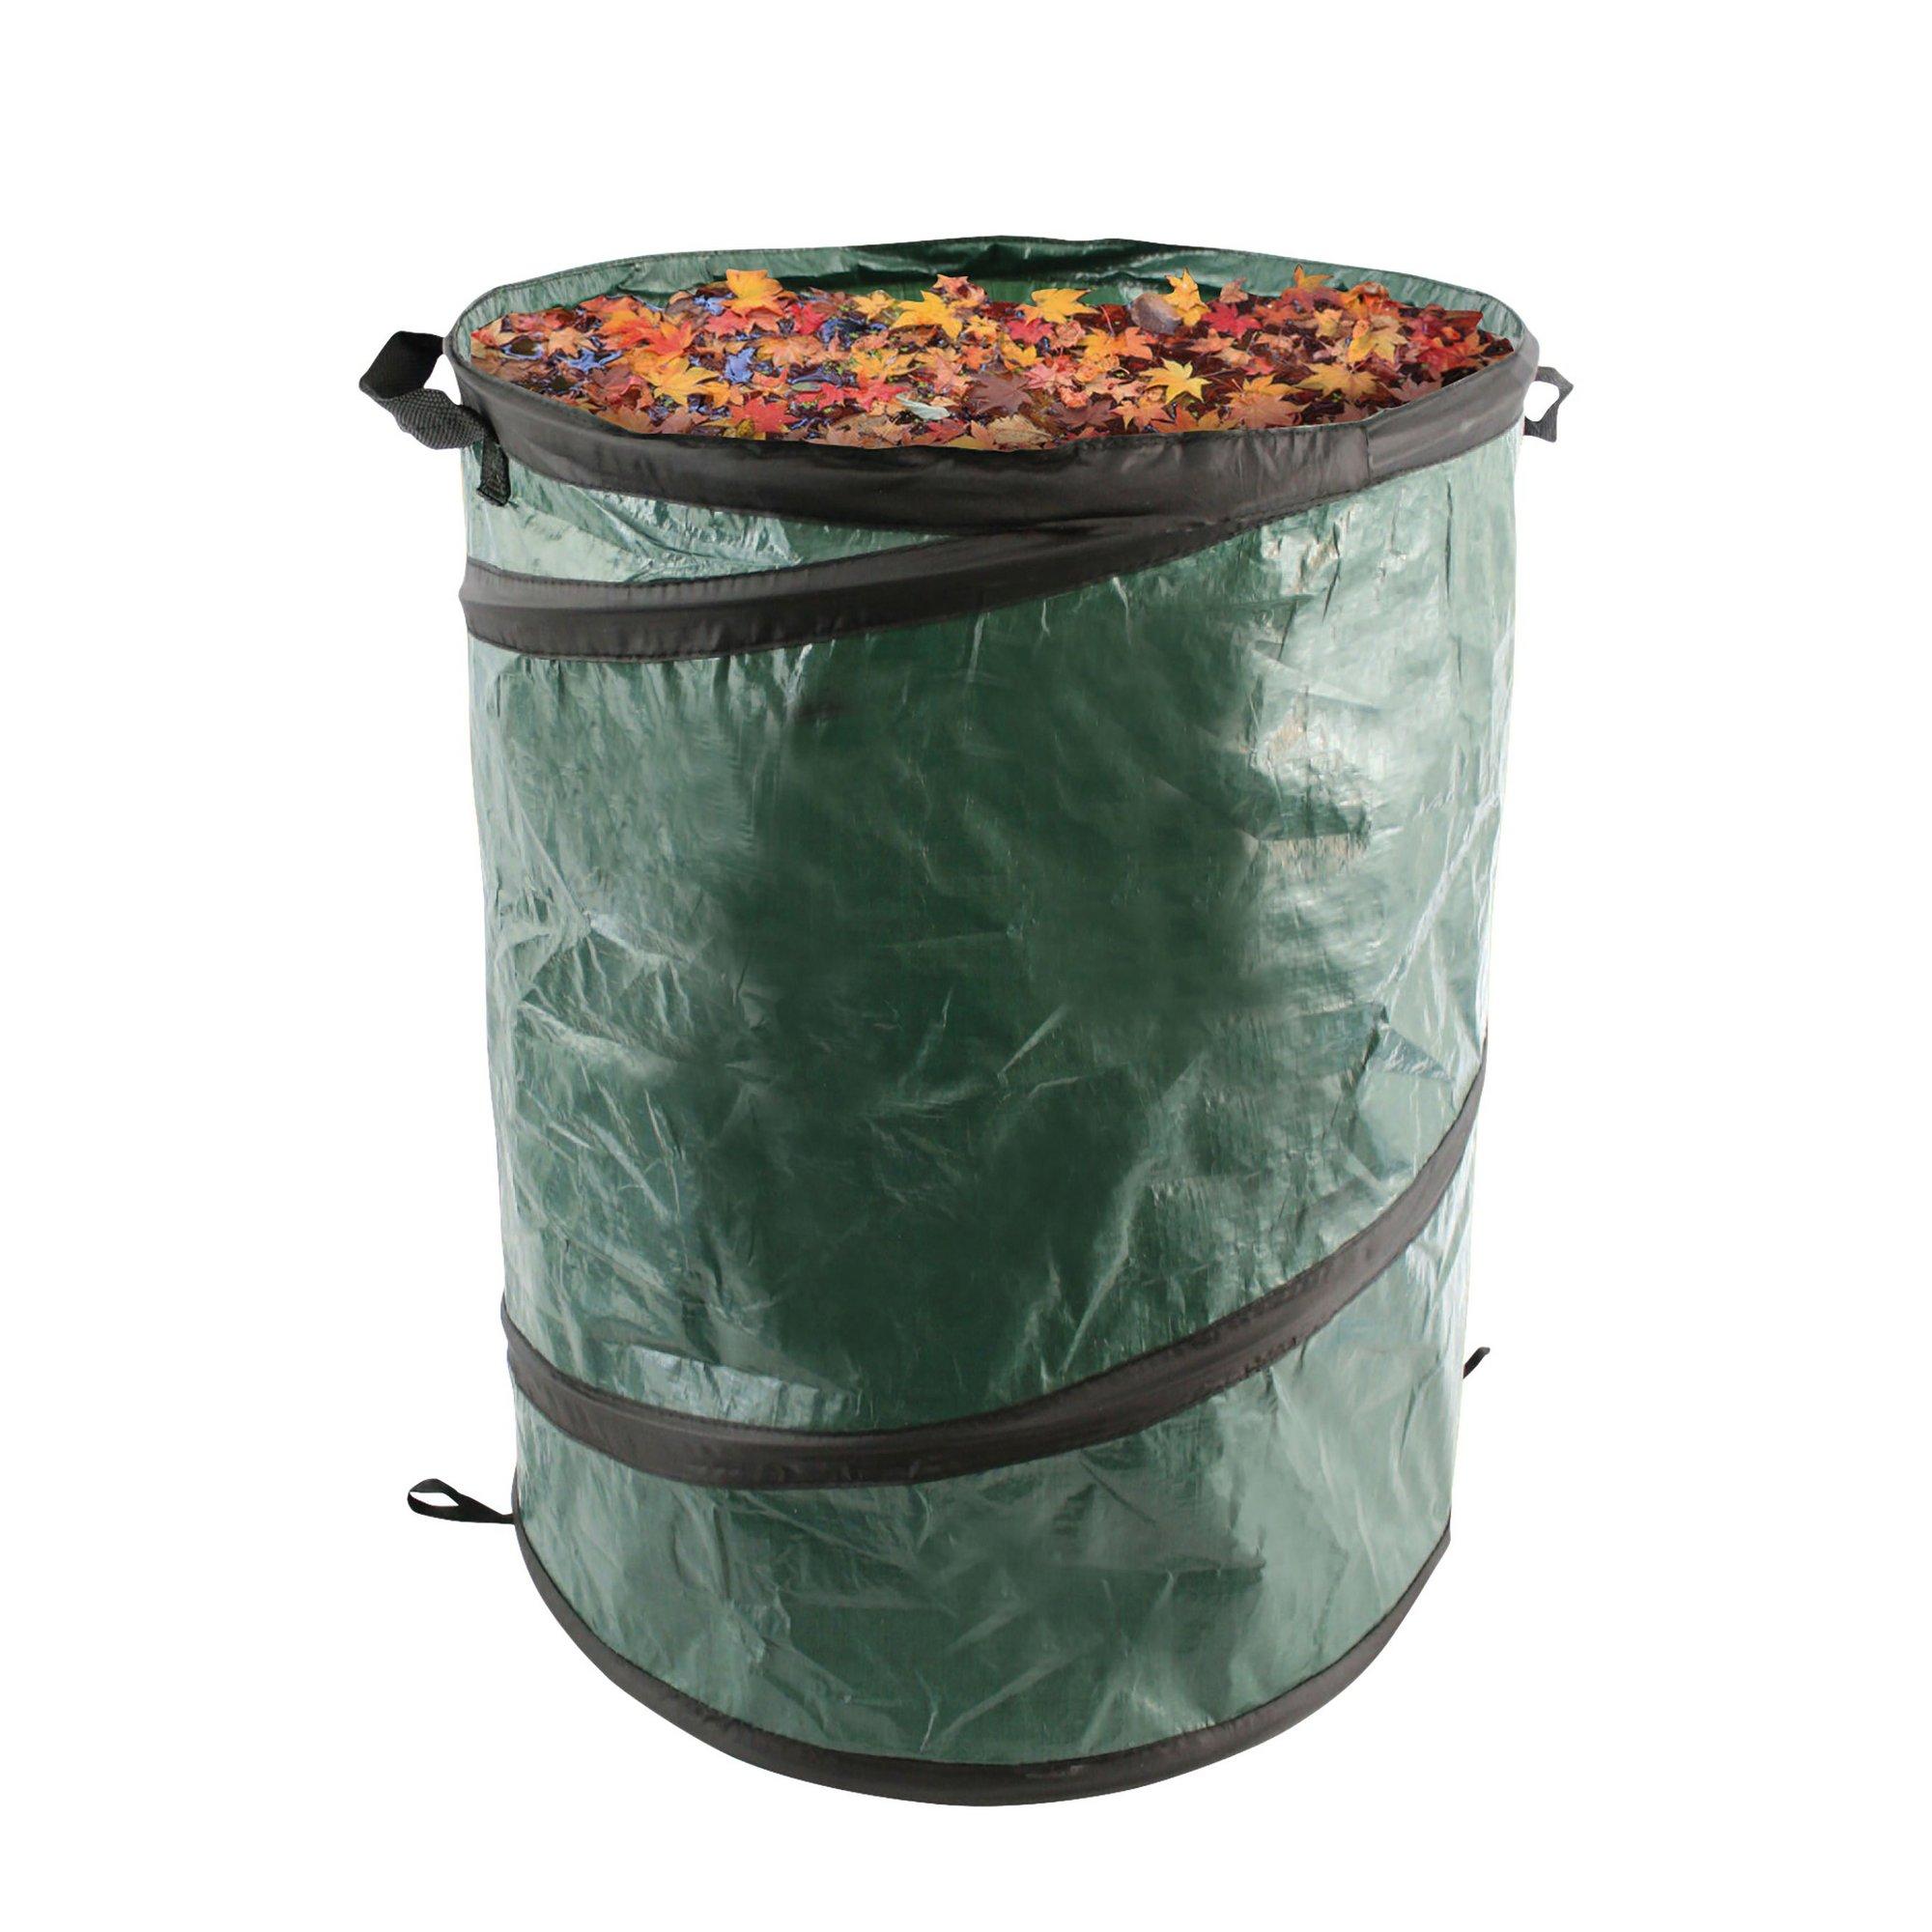 Image of 73 Litre Heavy Duty Pop-Up Garden Waste Bag Single